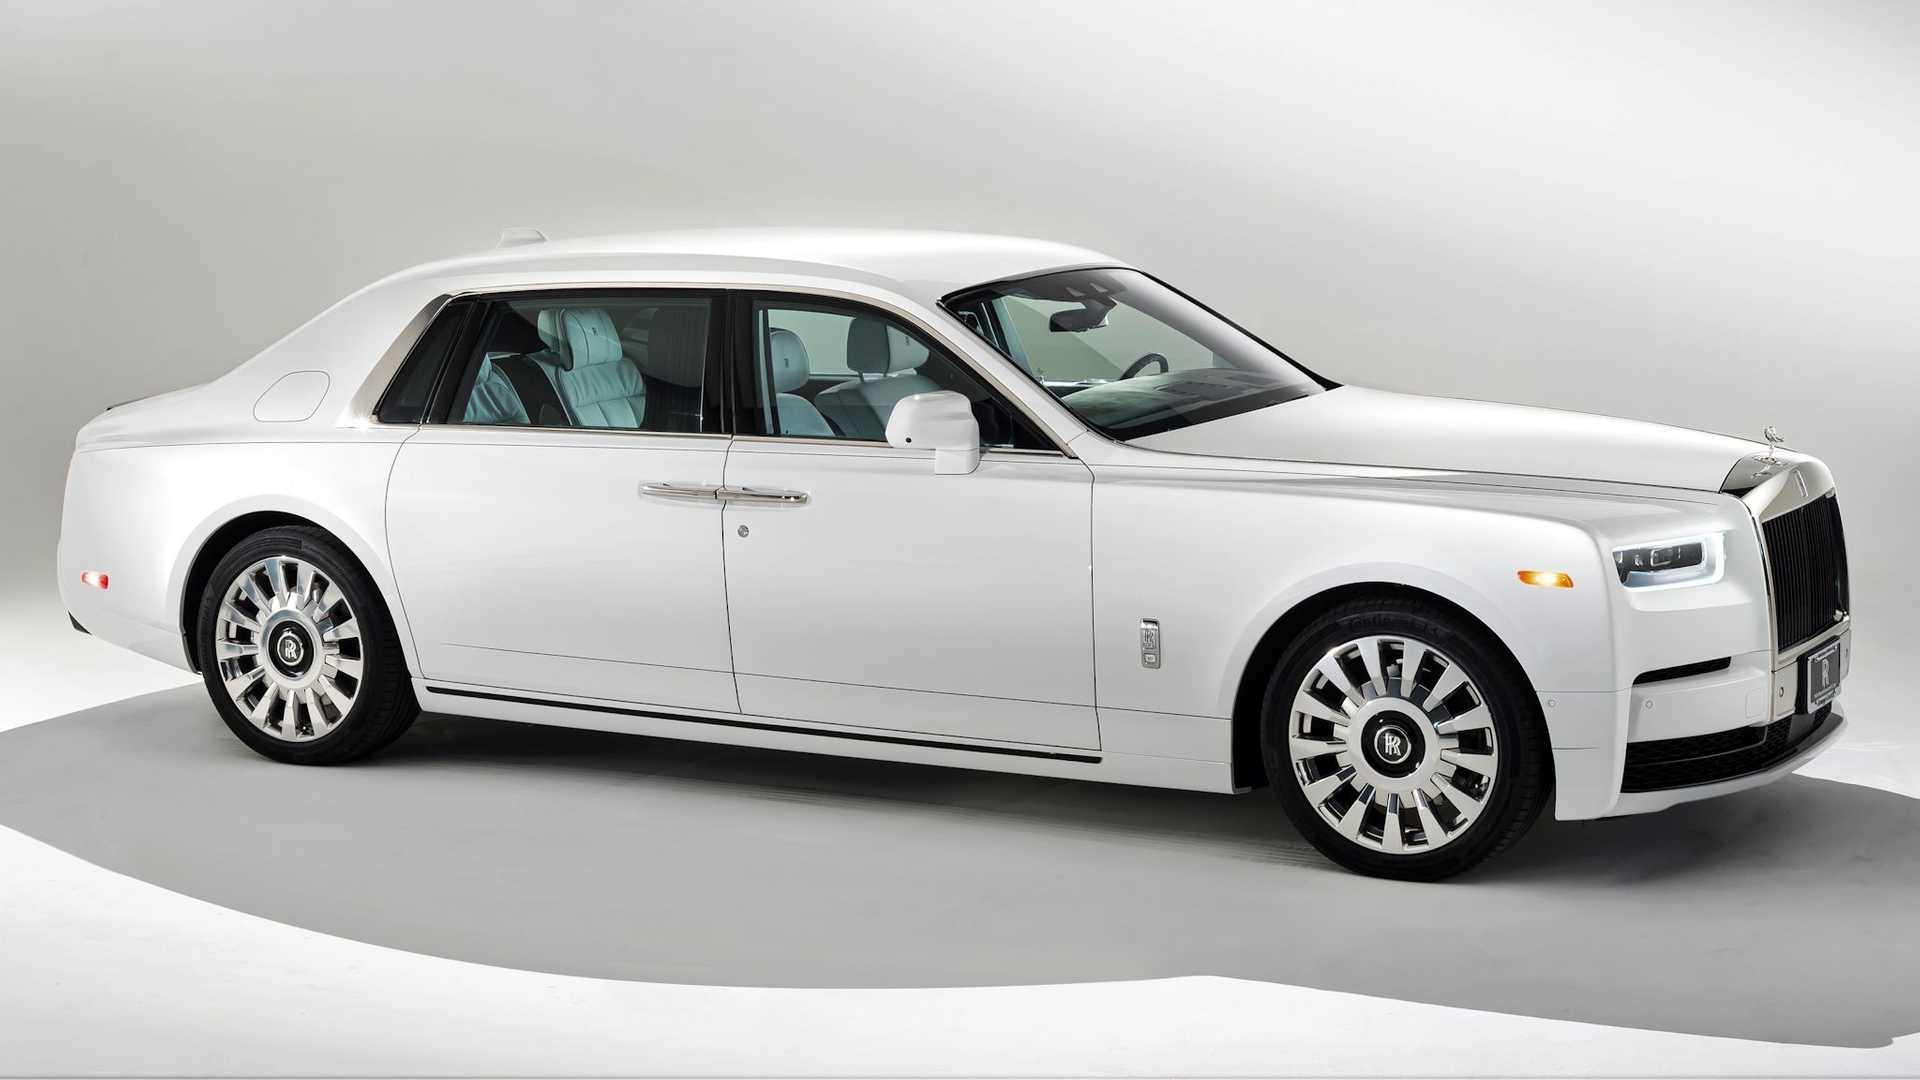 Bespoke-Rolls-Royce-Phantom-and-Dawn-18